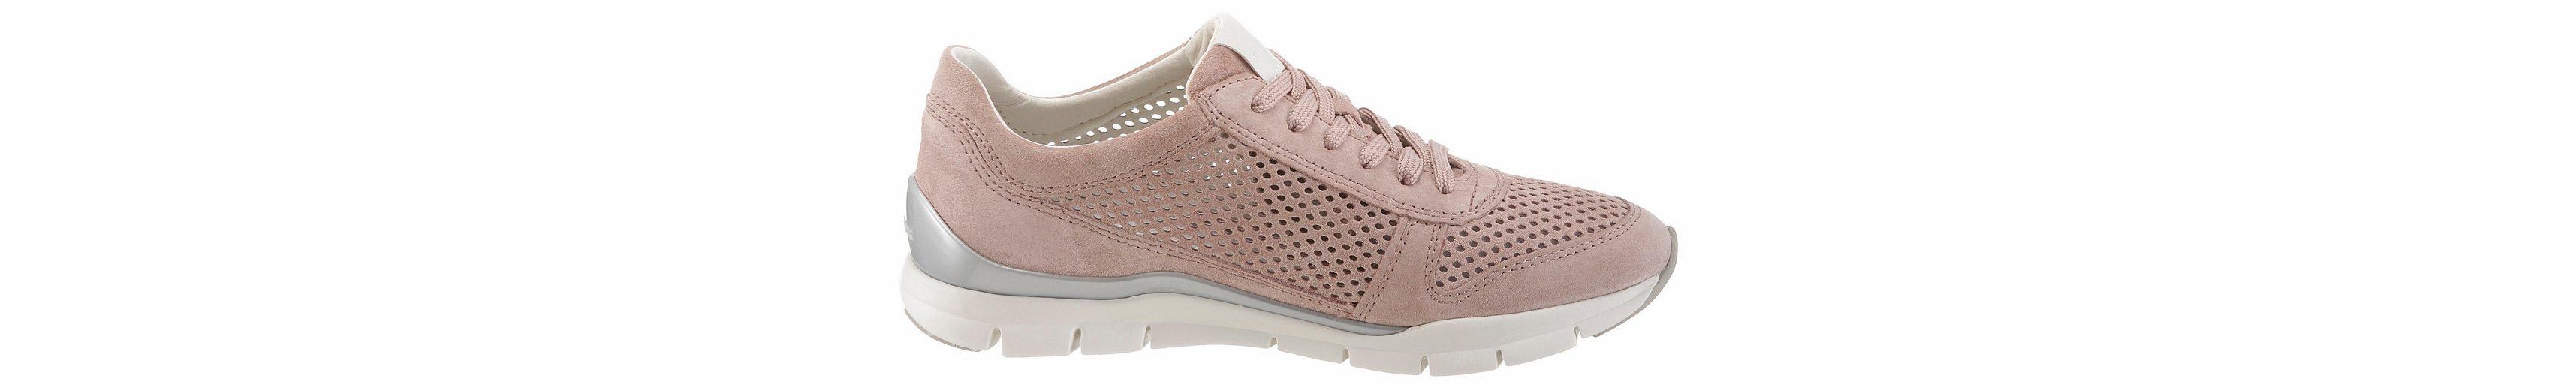 Geox Sukie Sneaker, mit Perforation